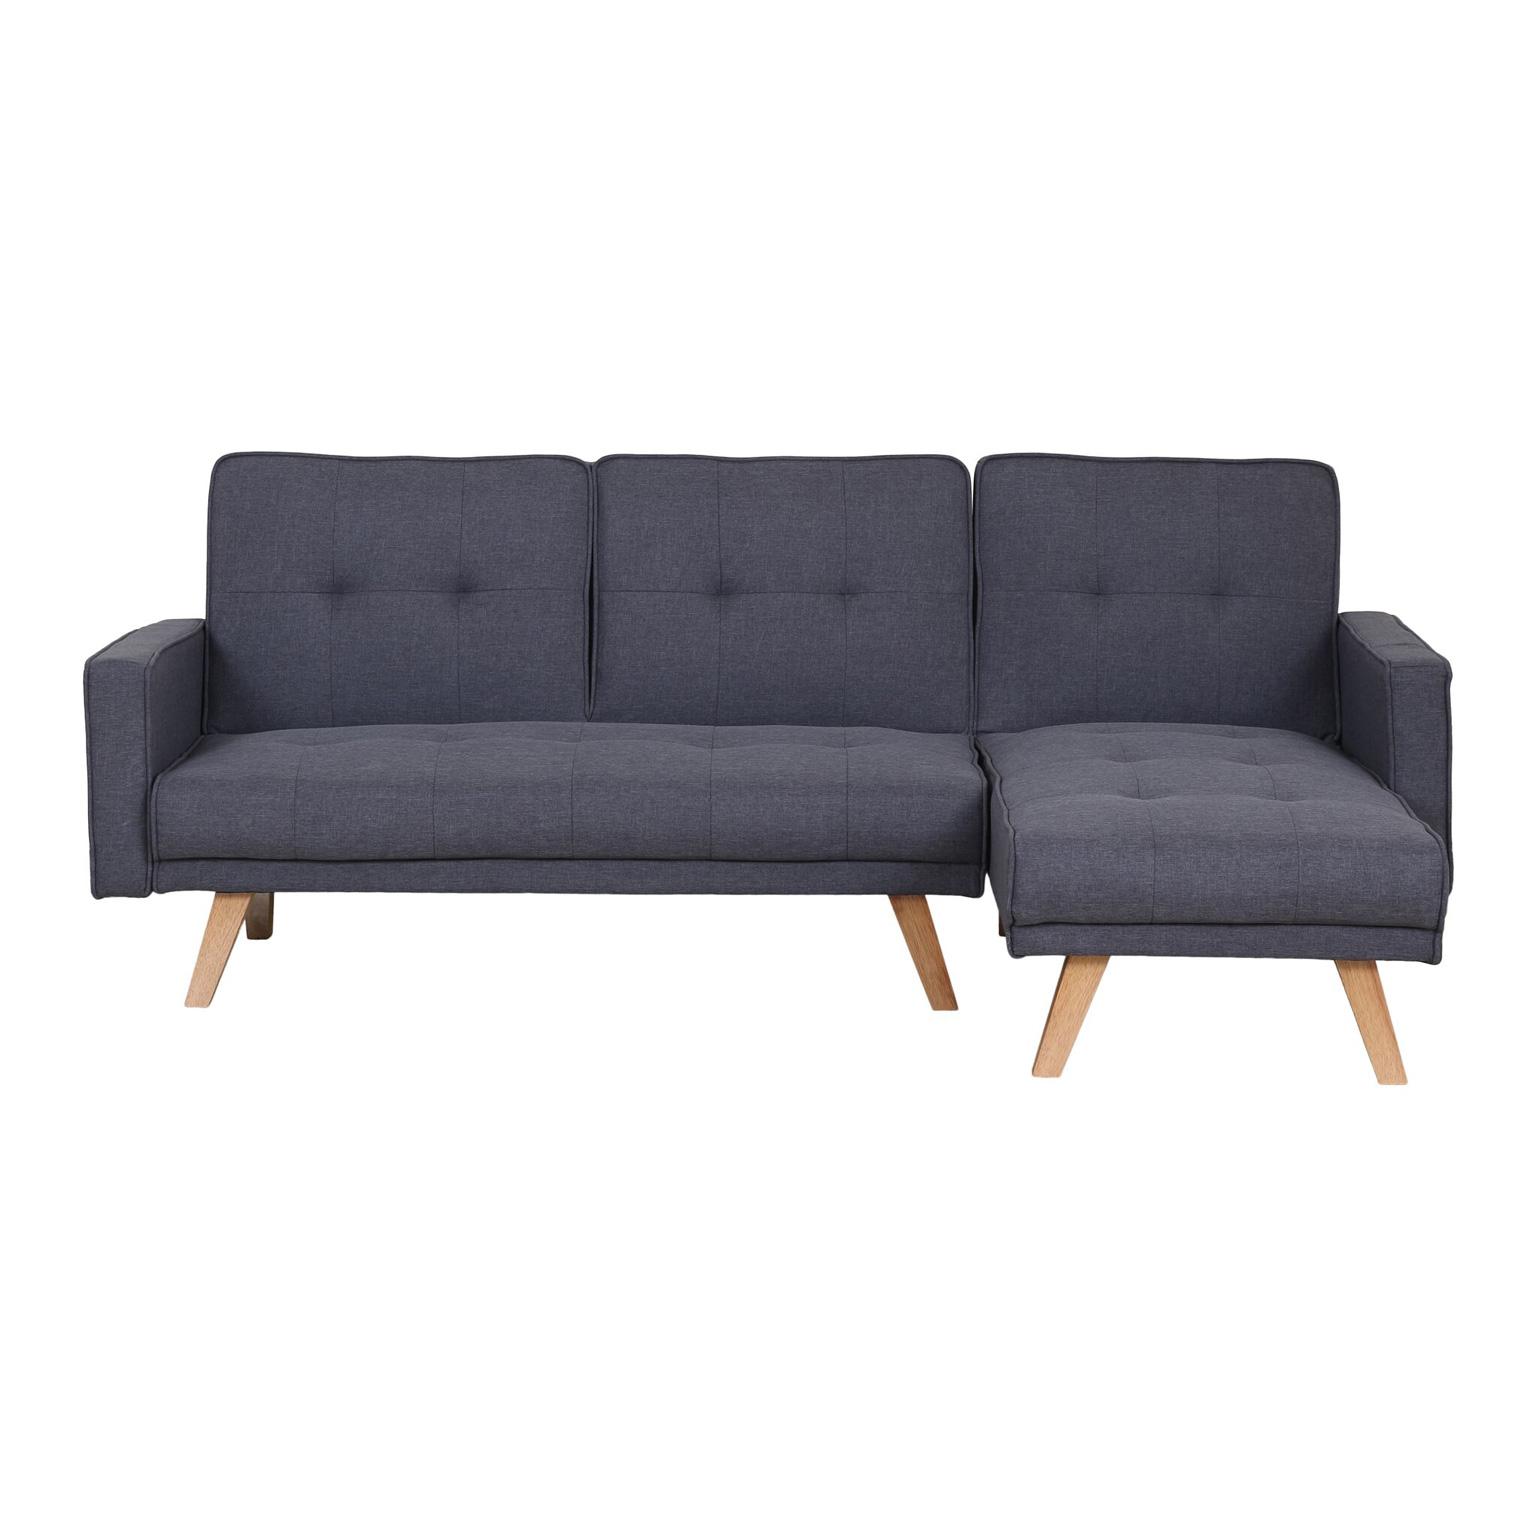 kitson corner sofa bed left hand or right hand sofa fads